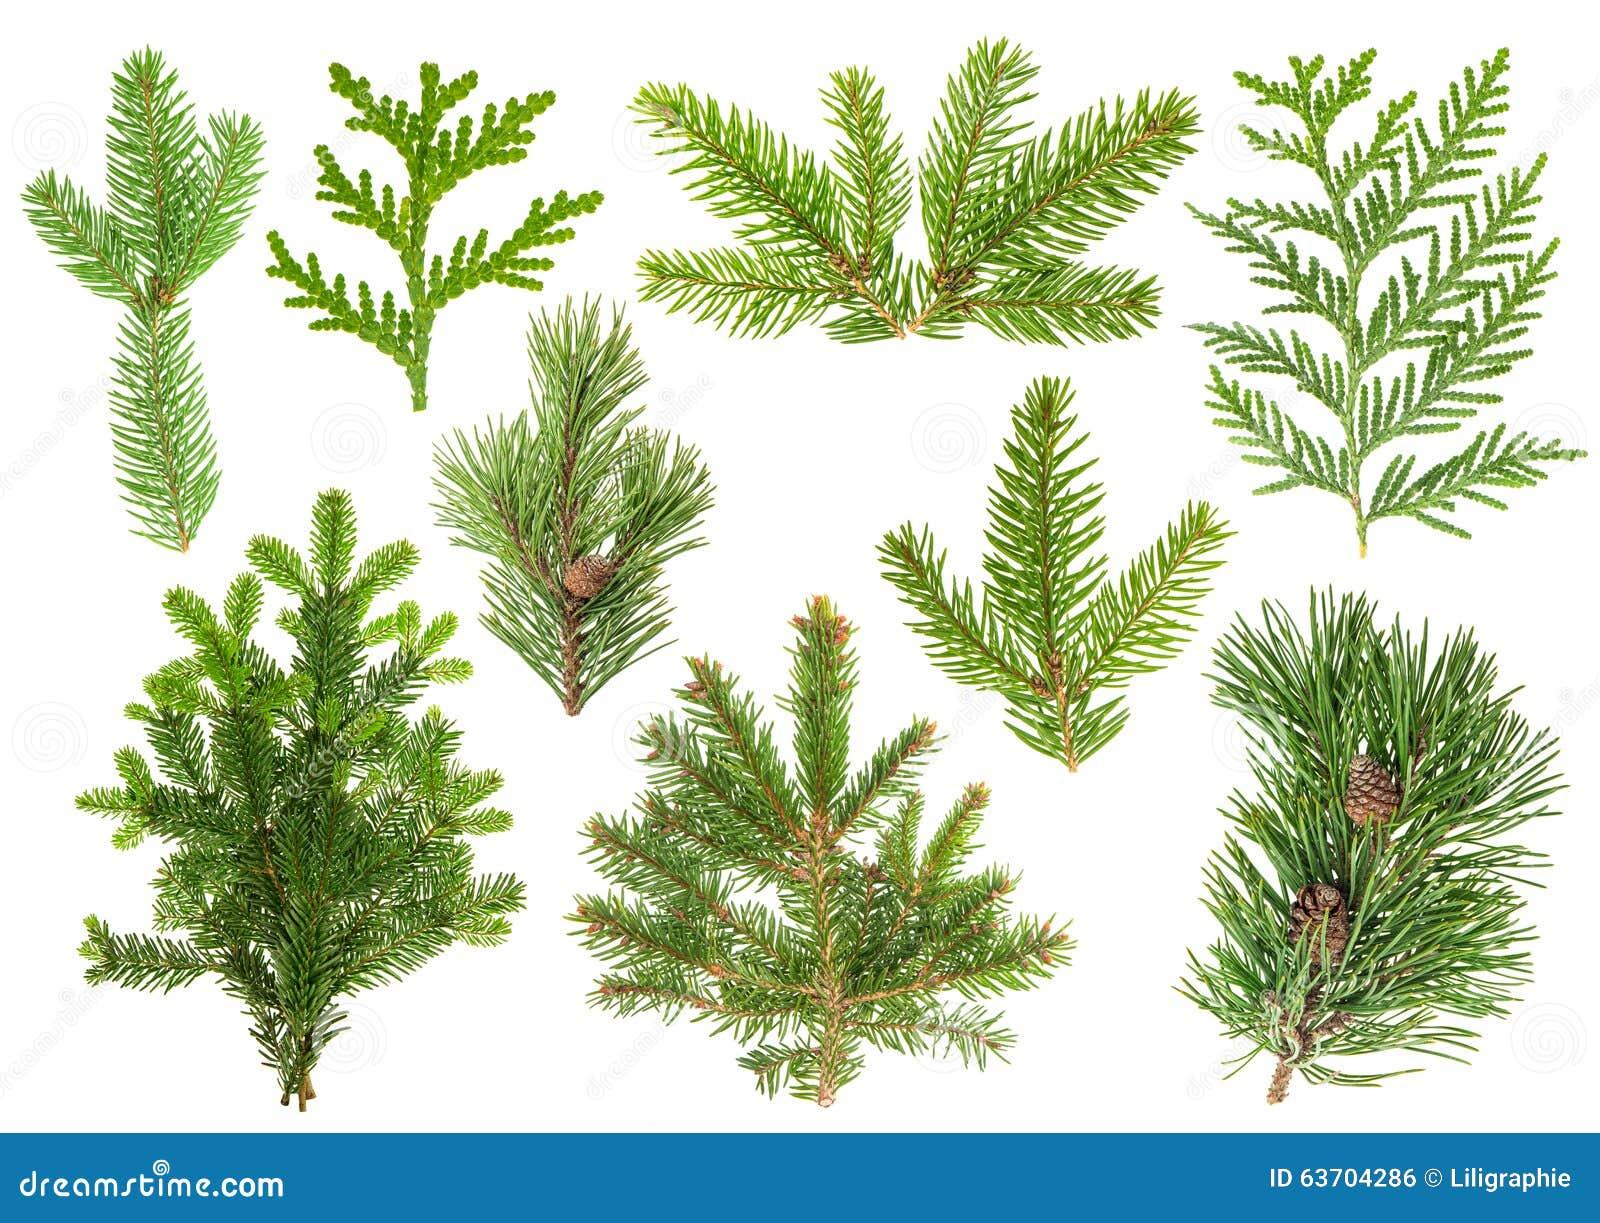 ensemble de branches d 39 arbre conif re sapin pin thuja sapin photo stock image 63704286. Black Bedroom Furniture Sets. Home Design Ideas